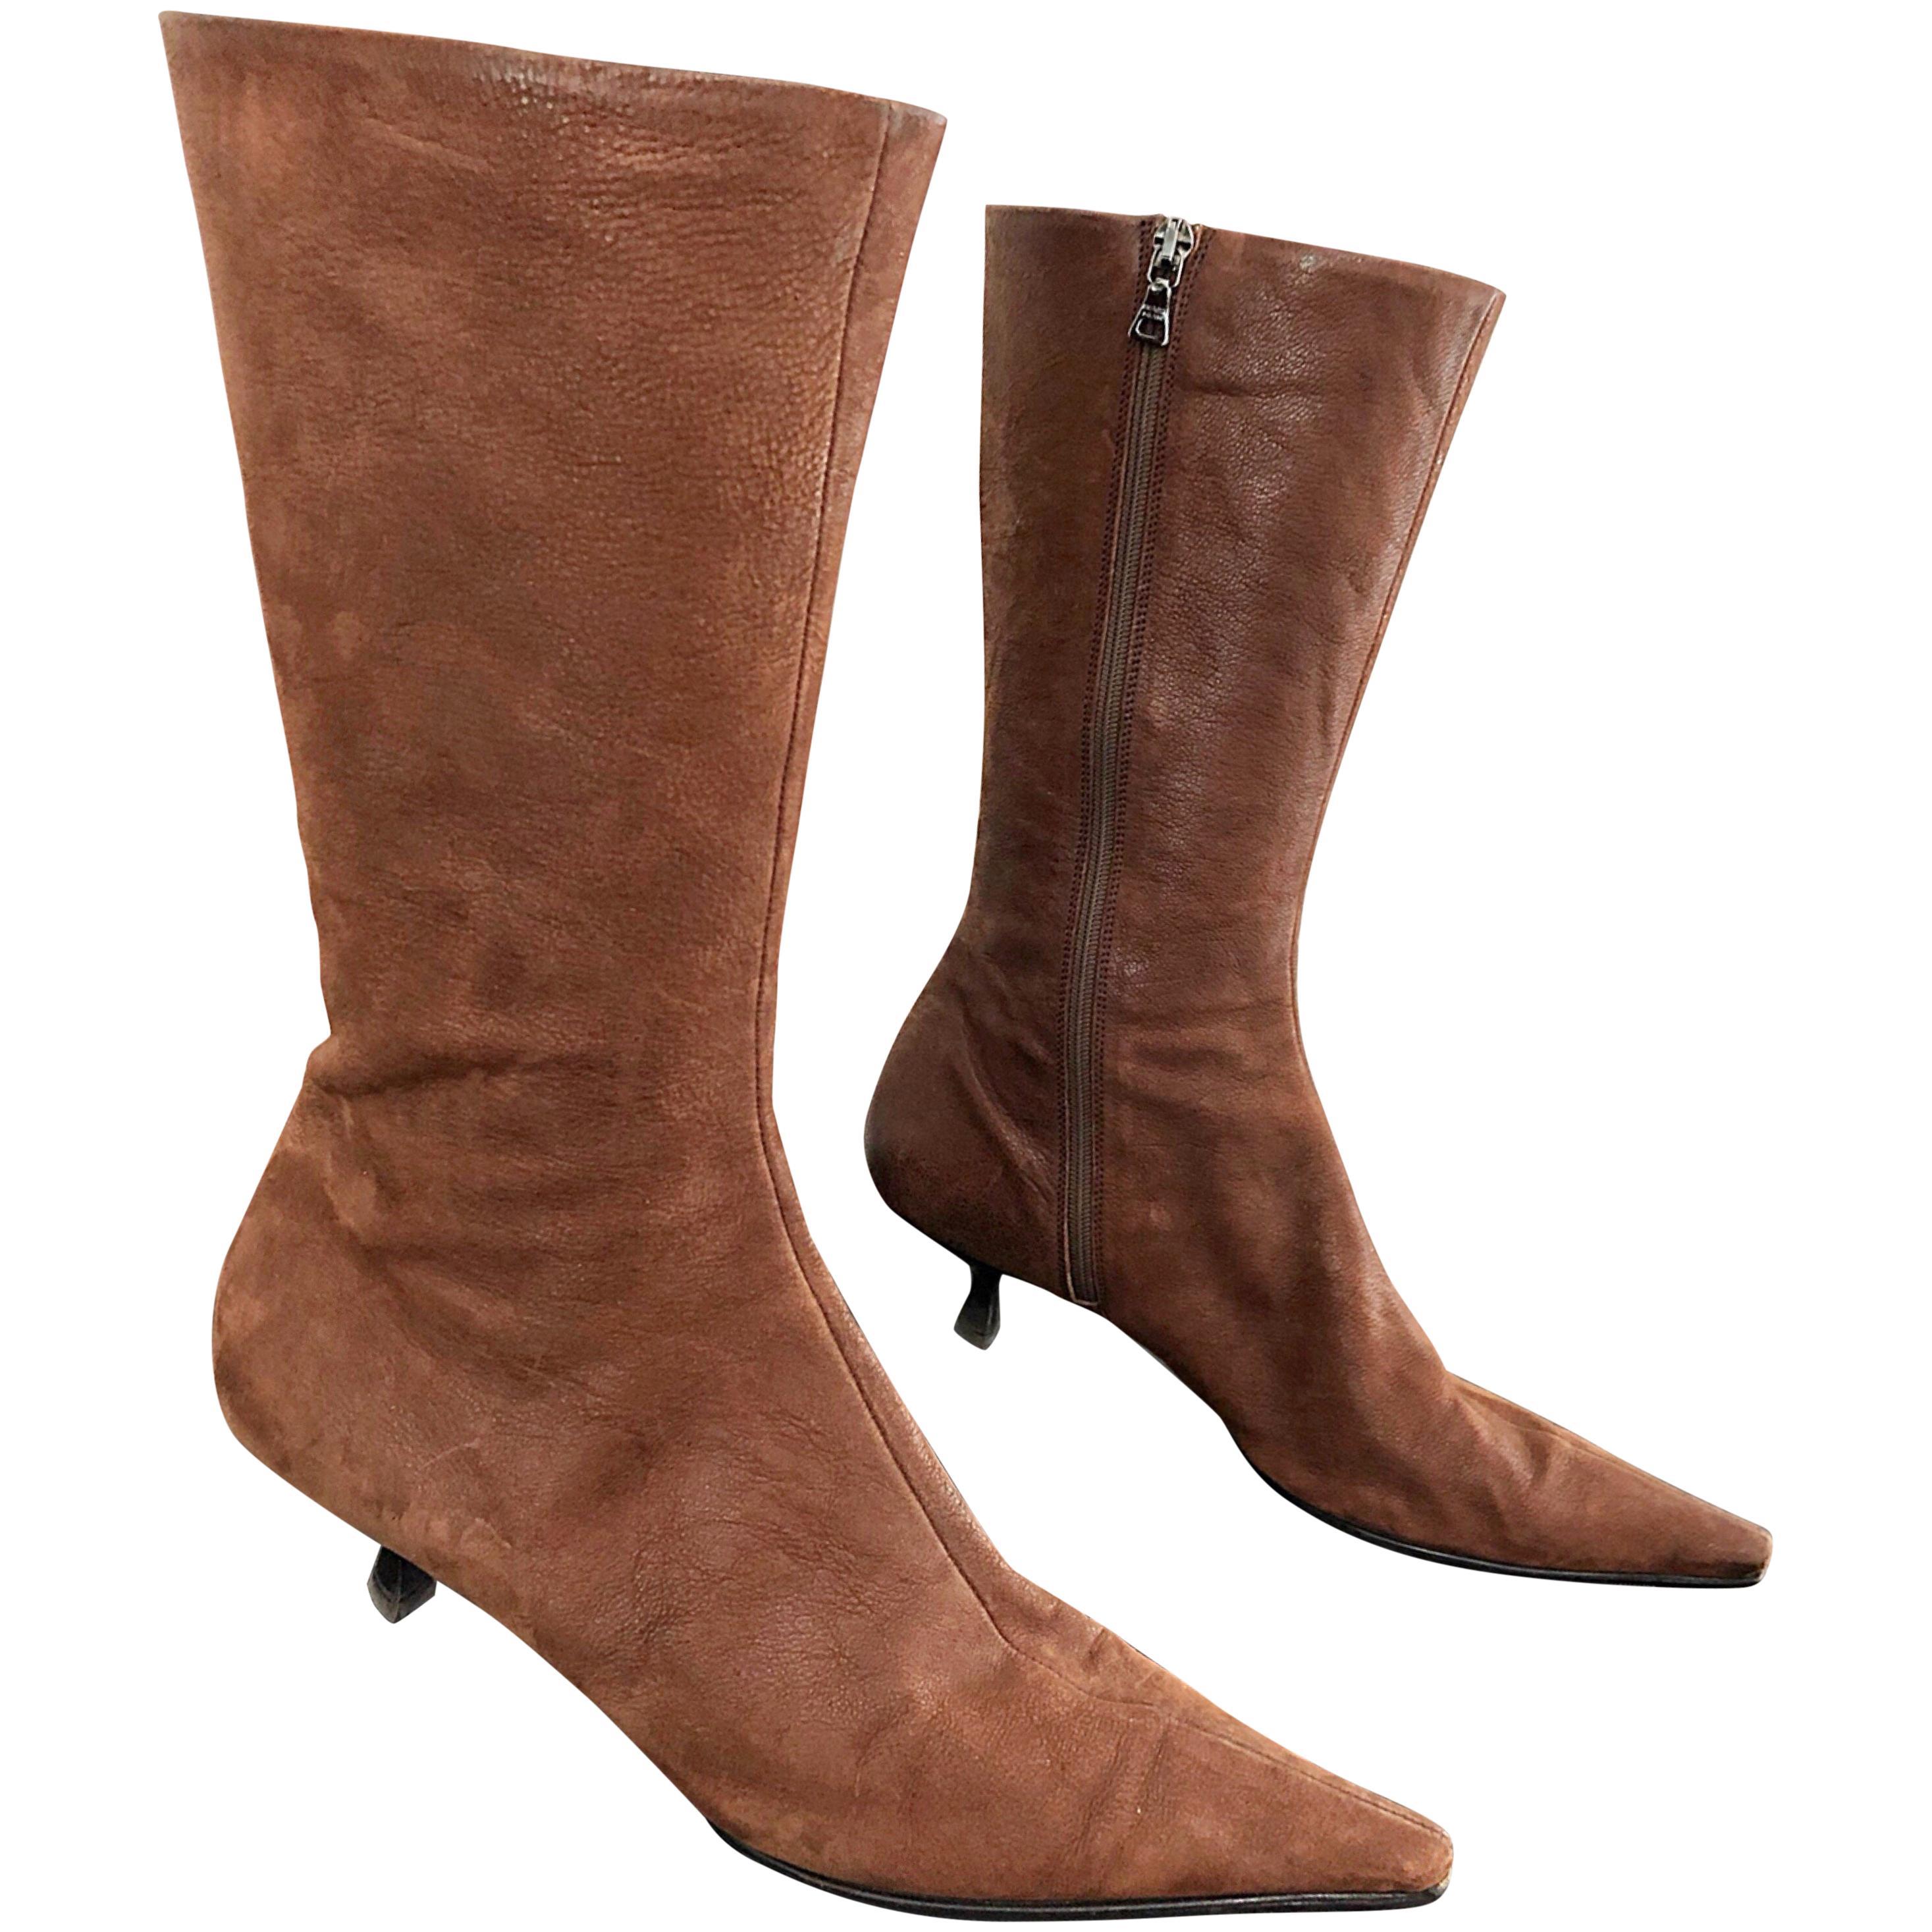 Prada Size 38.5 8.5 Brown Leather Mid